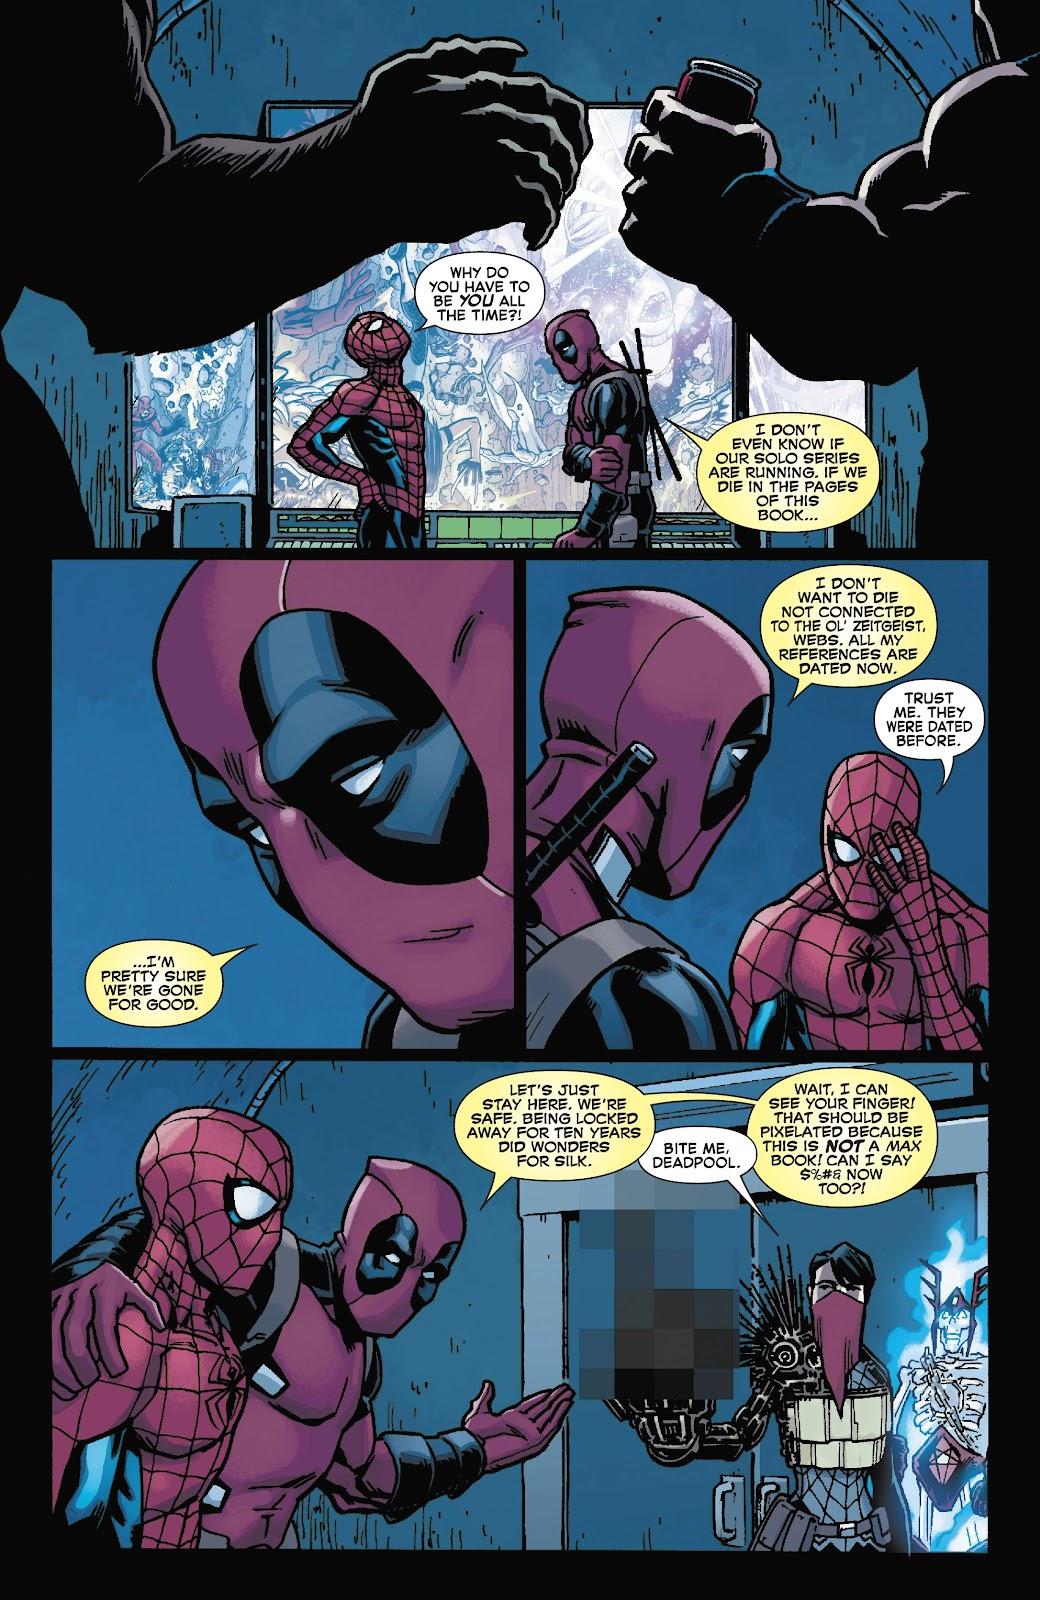 Read online Spider-Man/Deadpool comic -  Issue #47 - 9